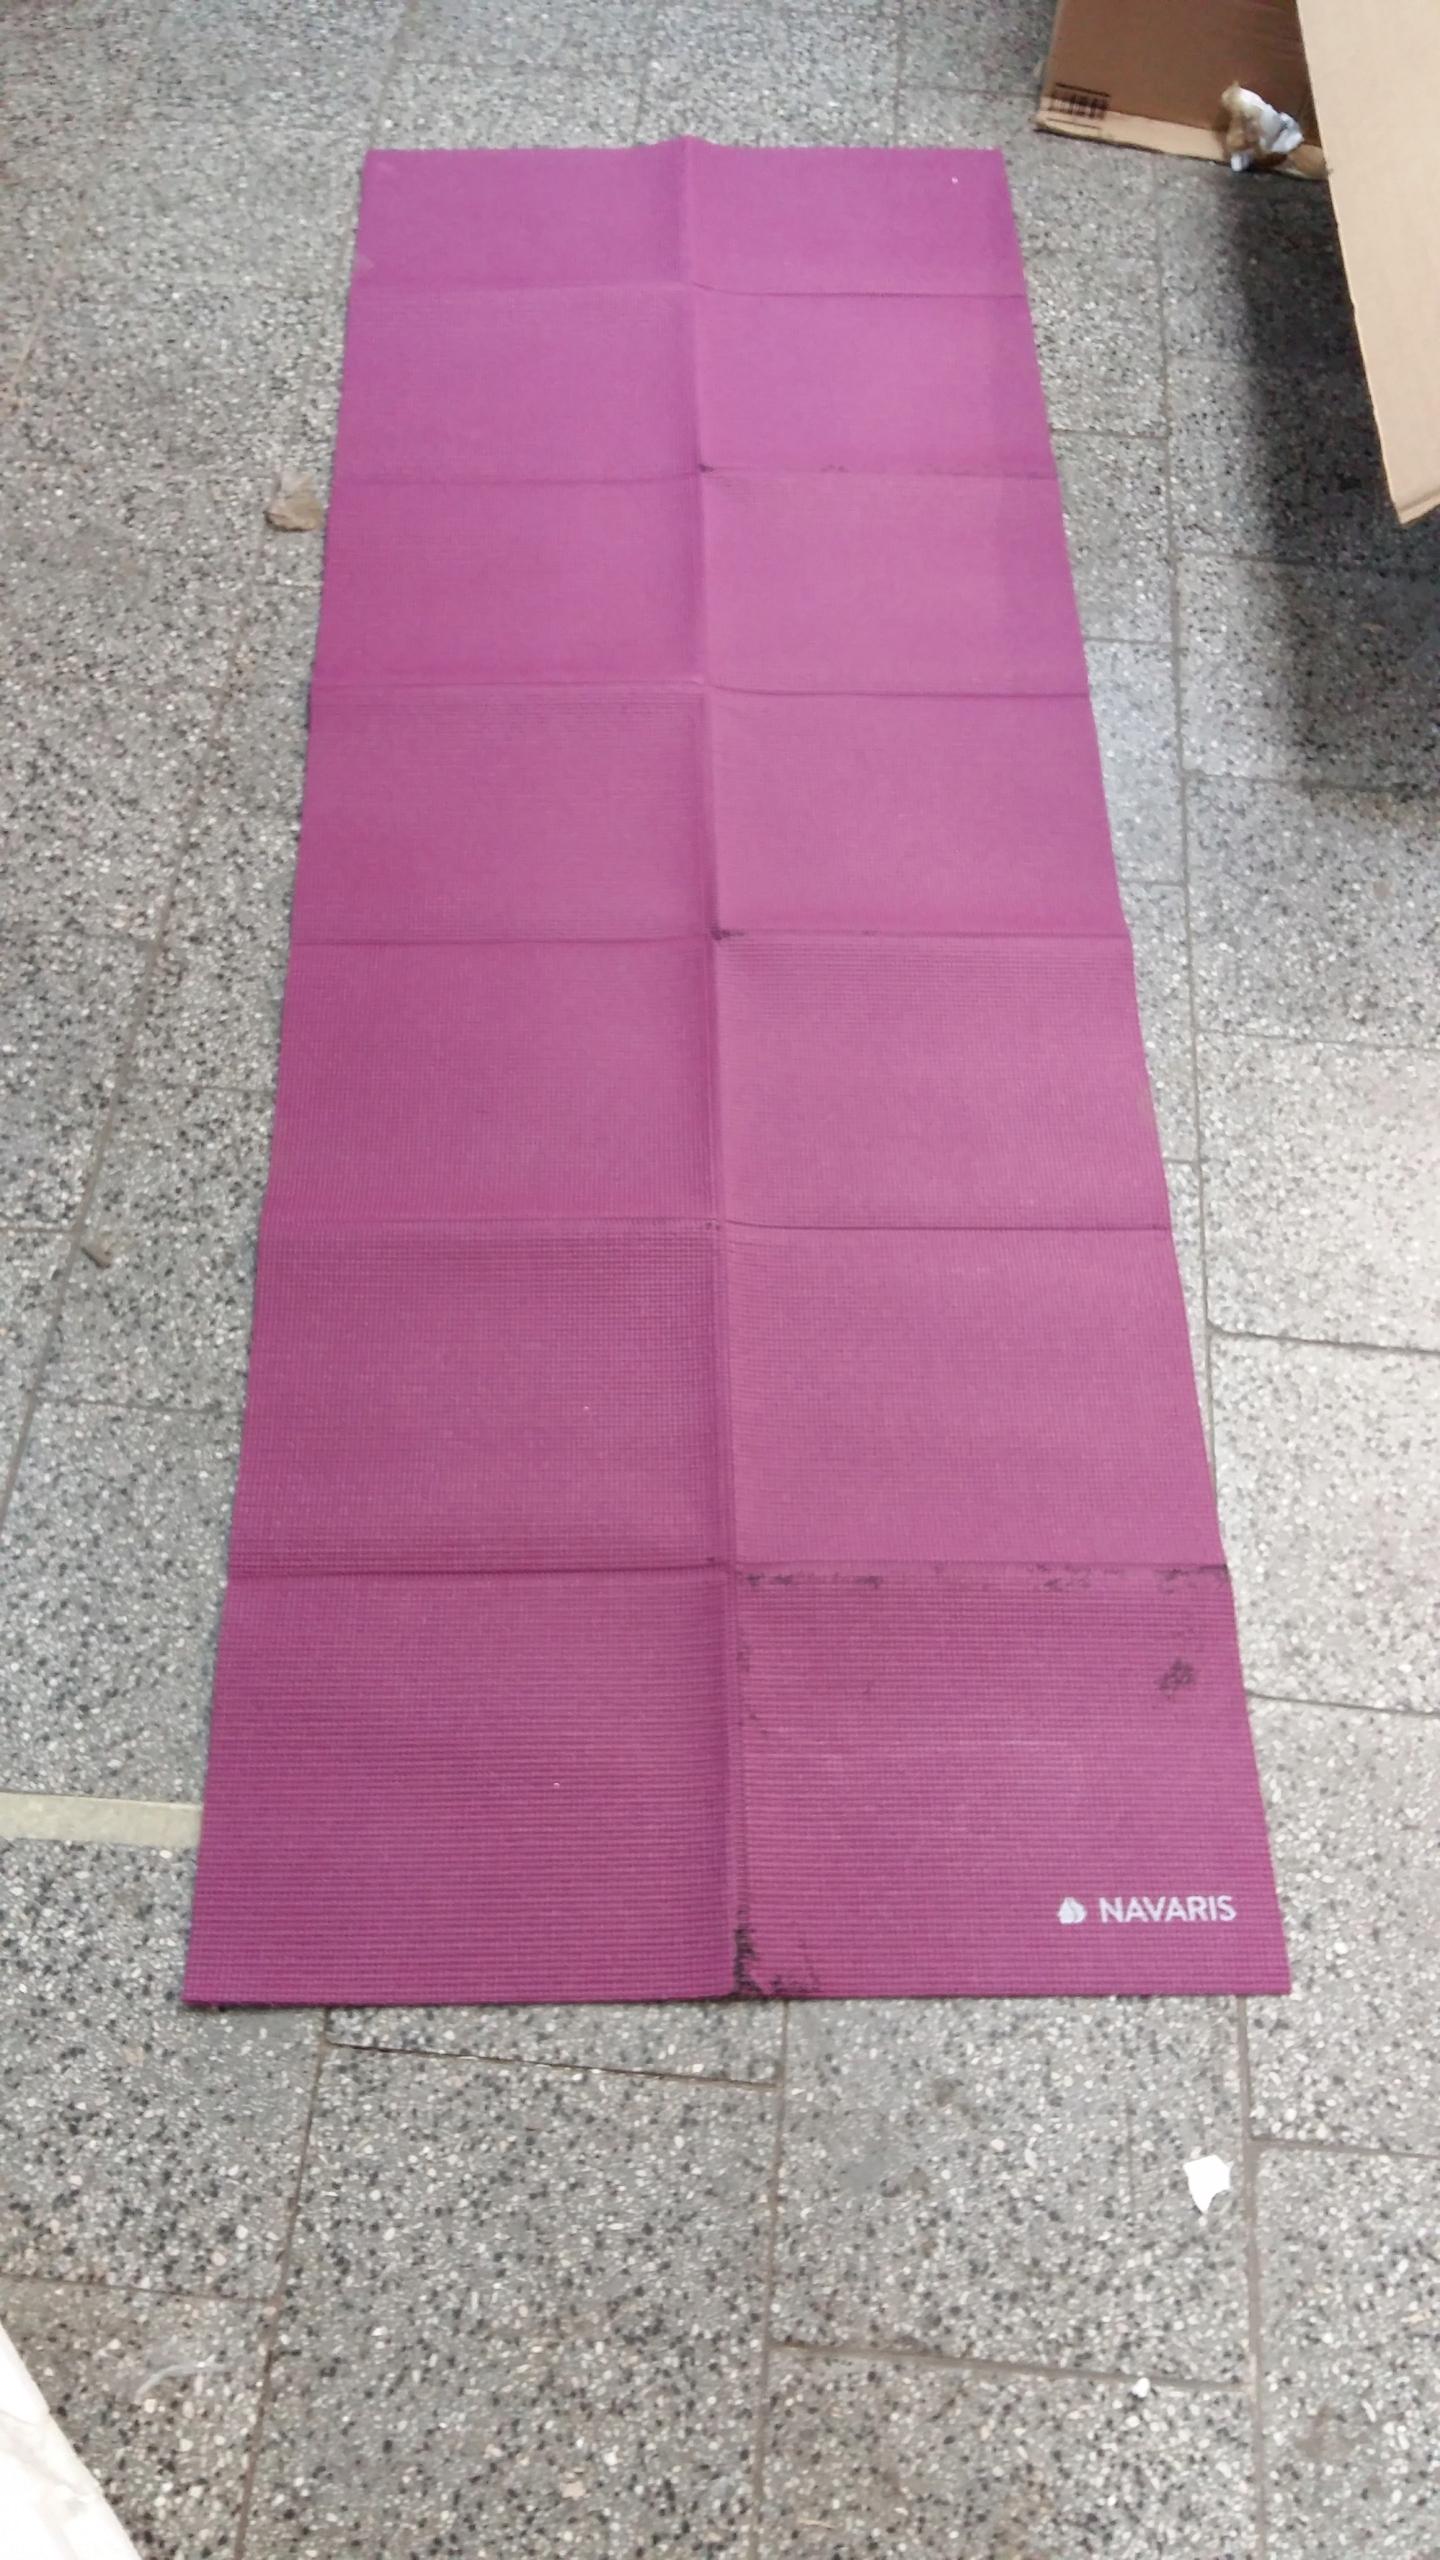 Mata do ćwiczeń fitnes składana NAVARIS